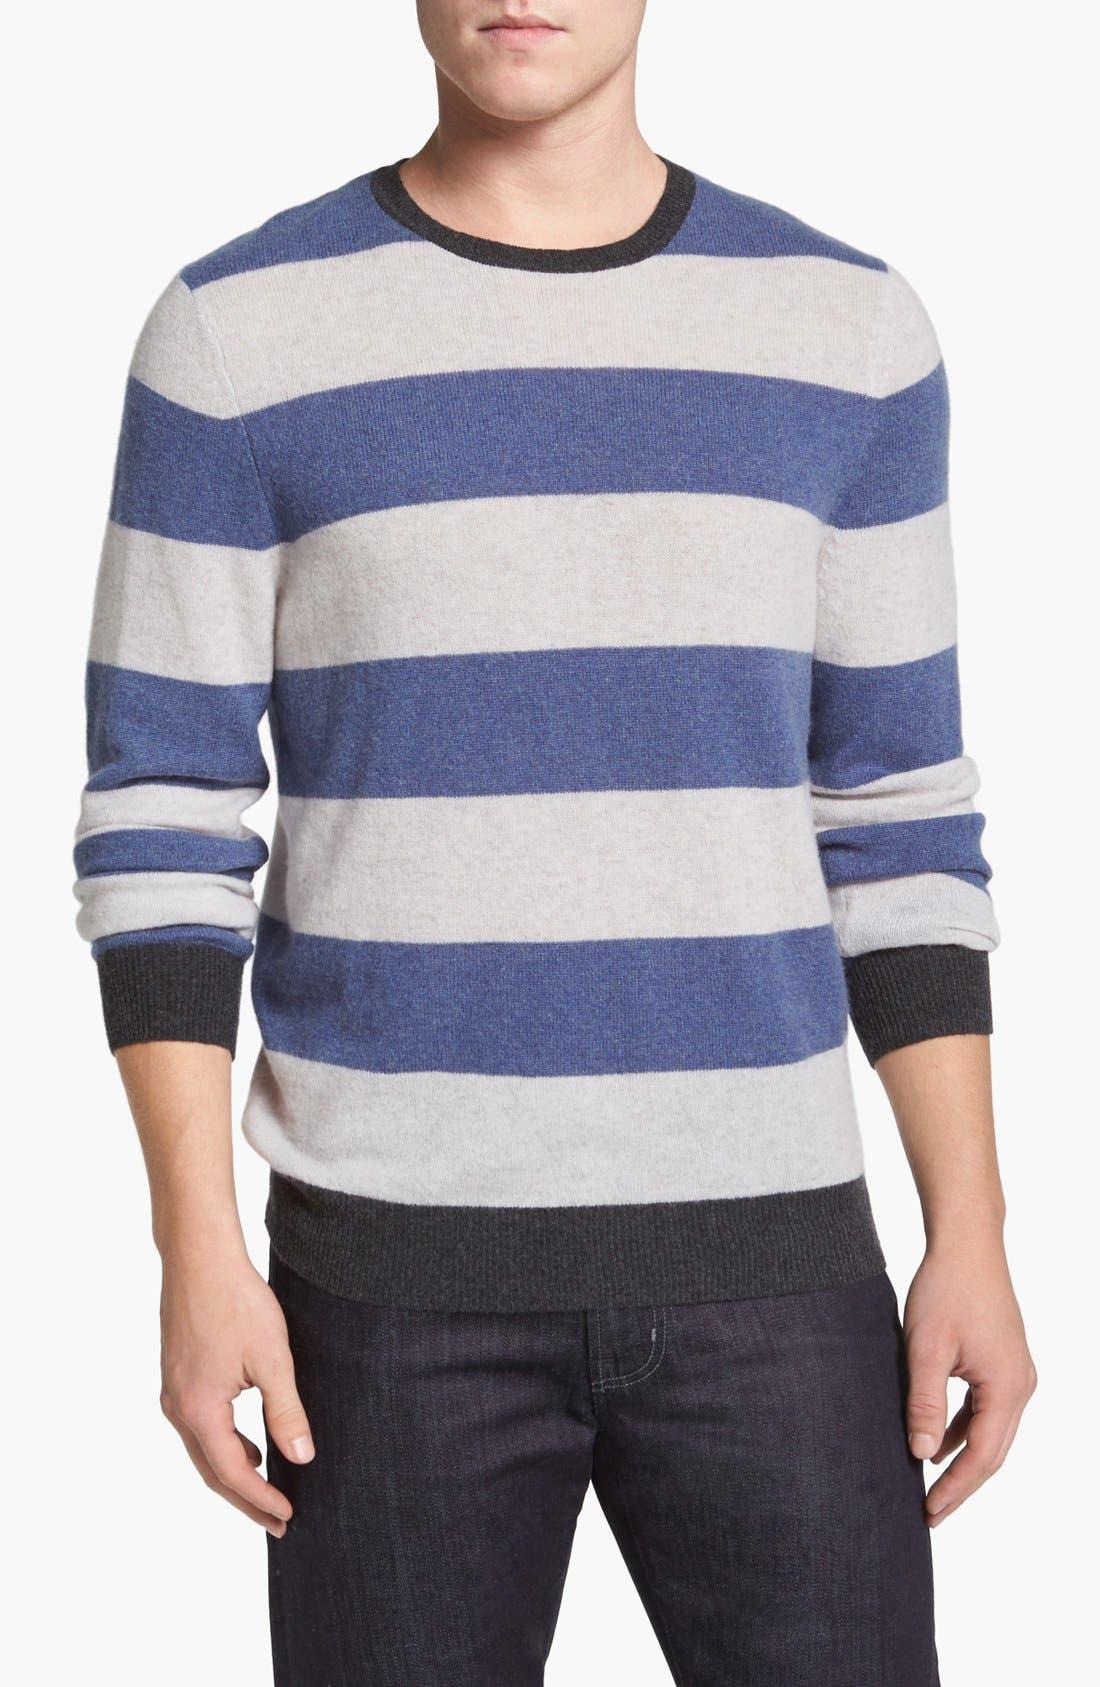 Main Image - 1901 Stripe Cashmere Crewneck Sweater